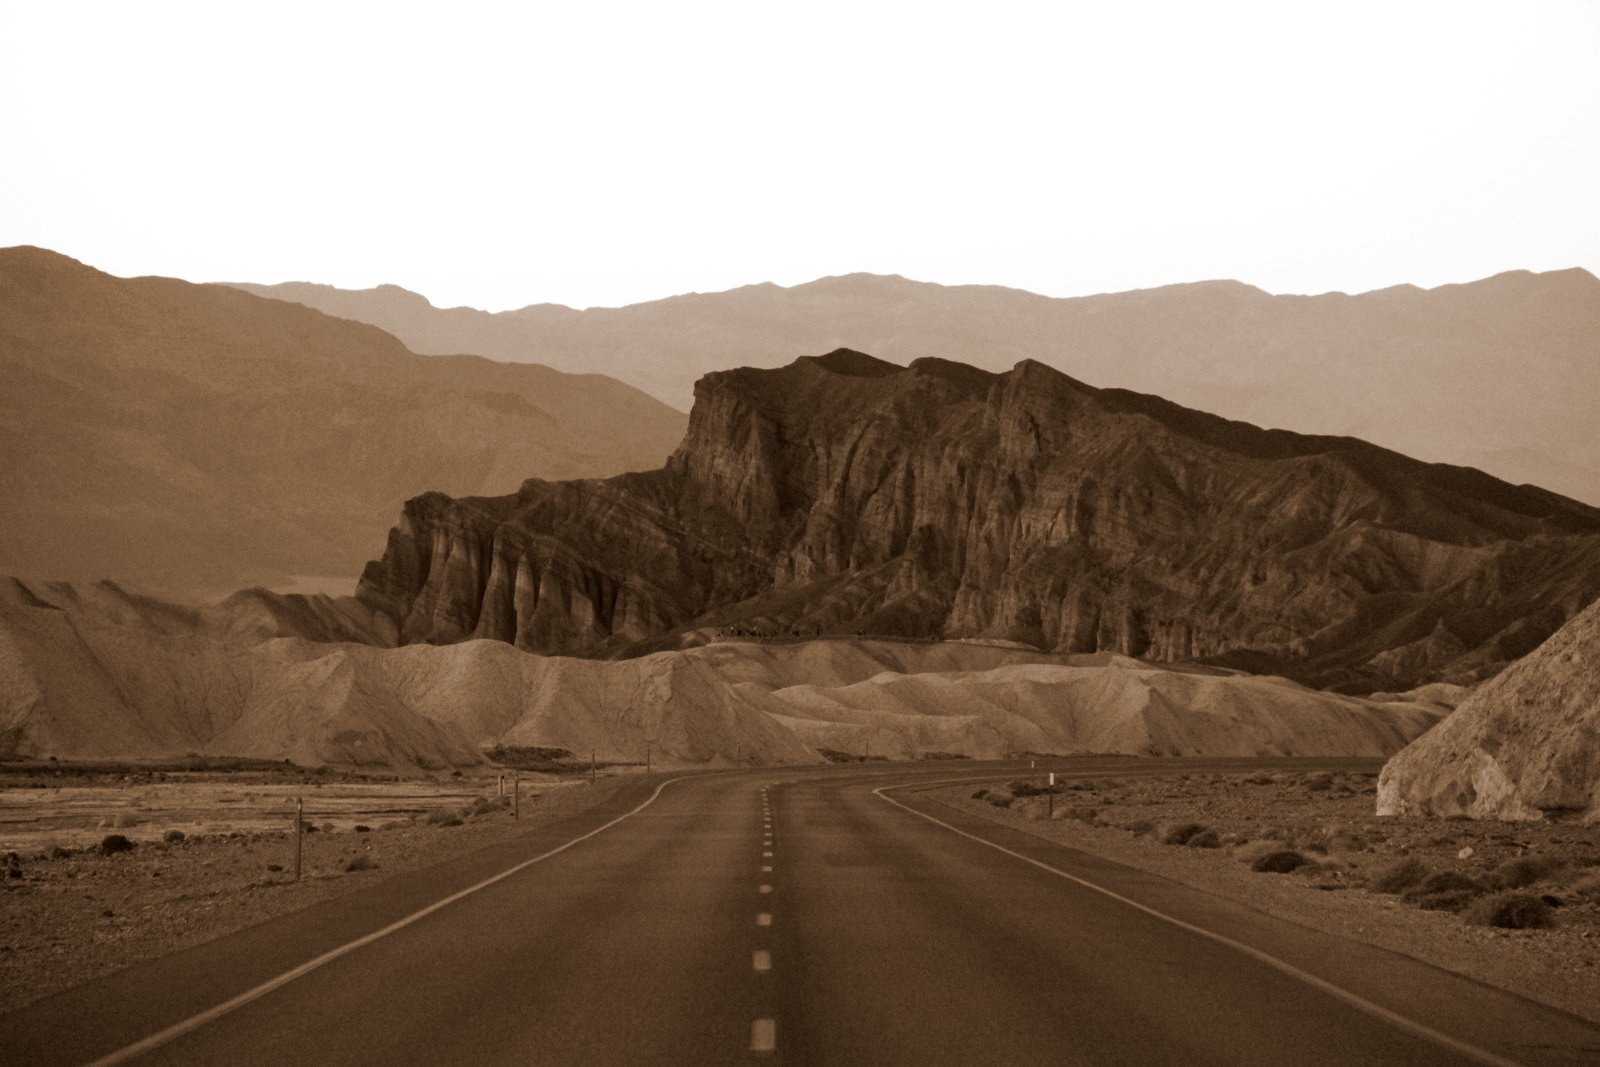 Dolina_Smierci_Death_Valley_Nevada_photo_photo_2495